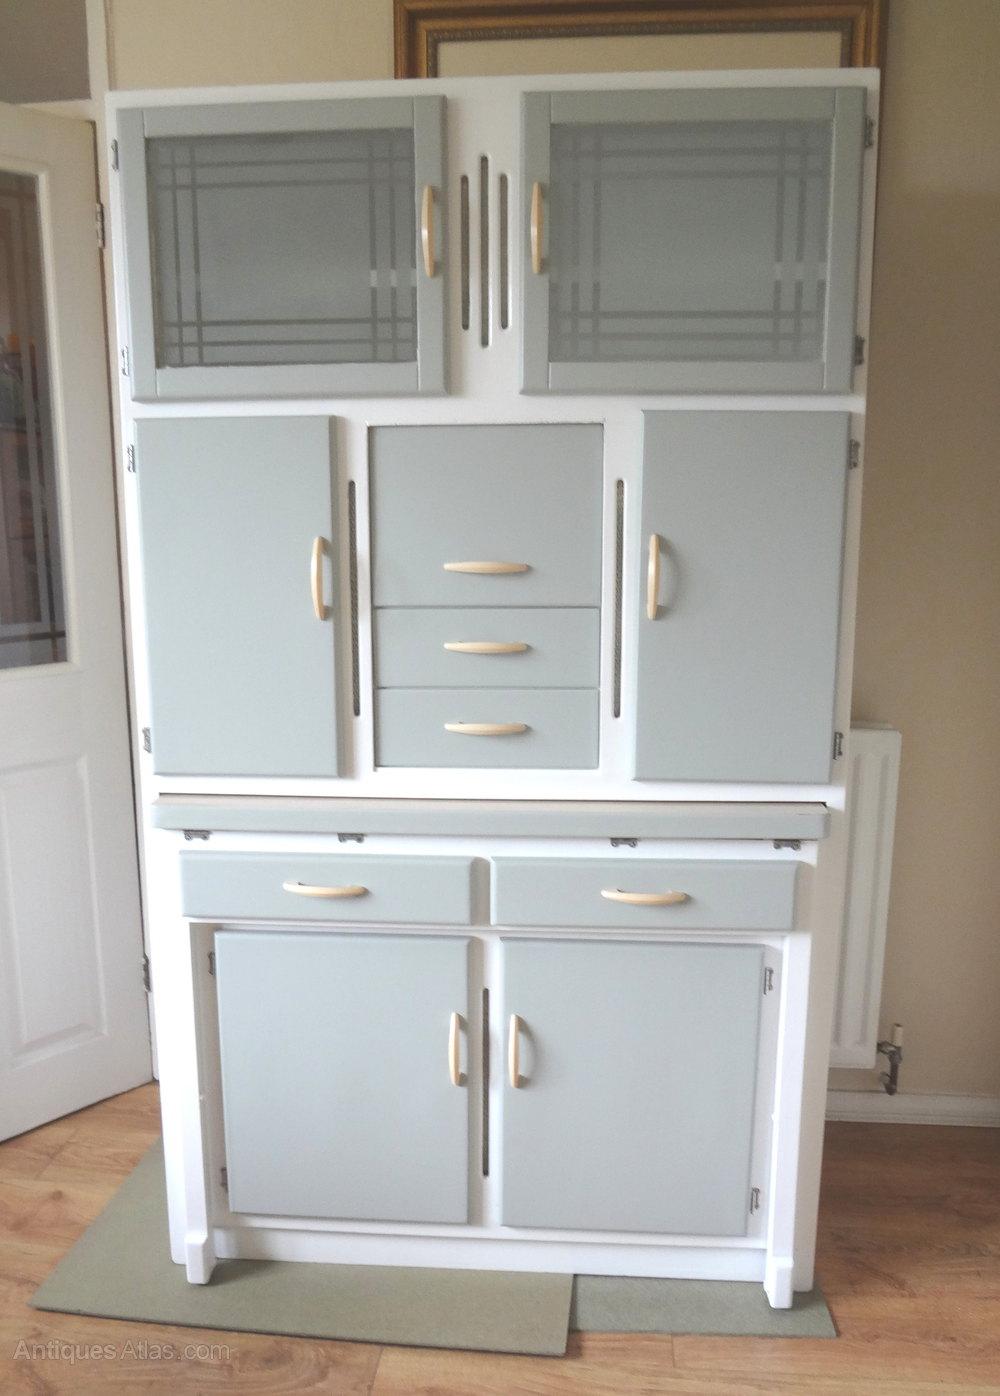 1940 Kitchen Cabinets Tw07 Roccommunity Kitchen Cabinets For Sale Vintage Kitchen Cabinets Vintage Kitchen Cabinets 1950s